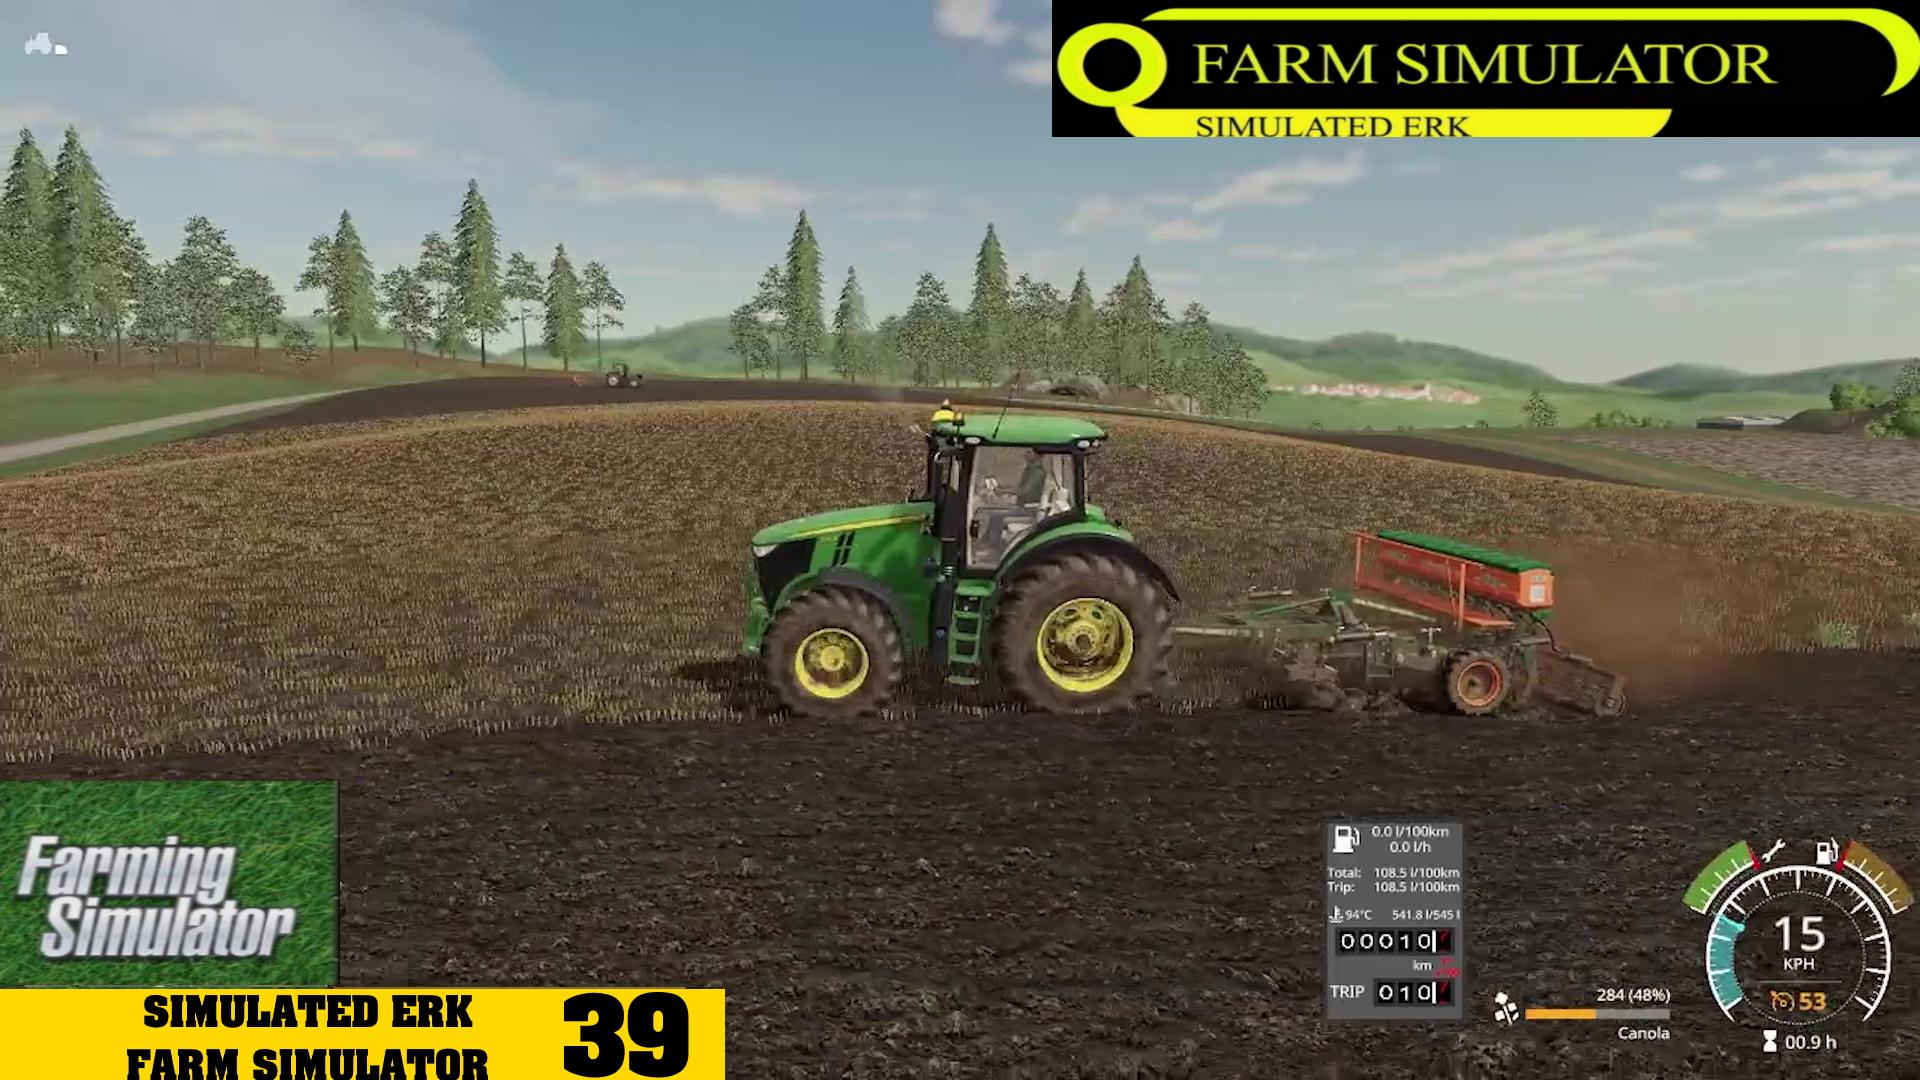 Simulated Erk: Farm Simulator episode 39   Rebuilding The Farm Like A Millennial